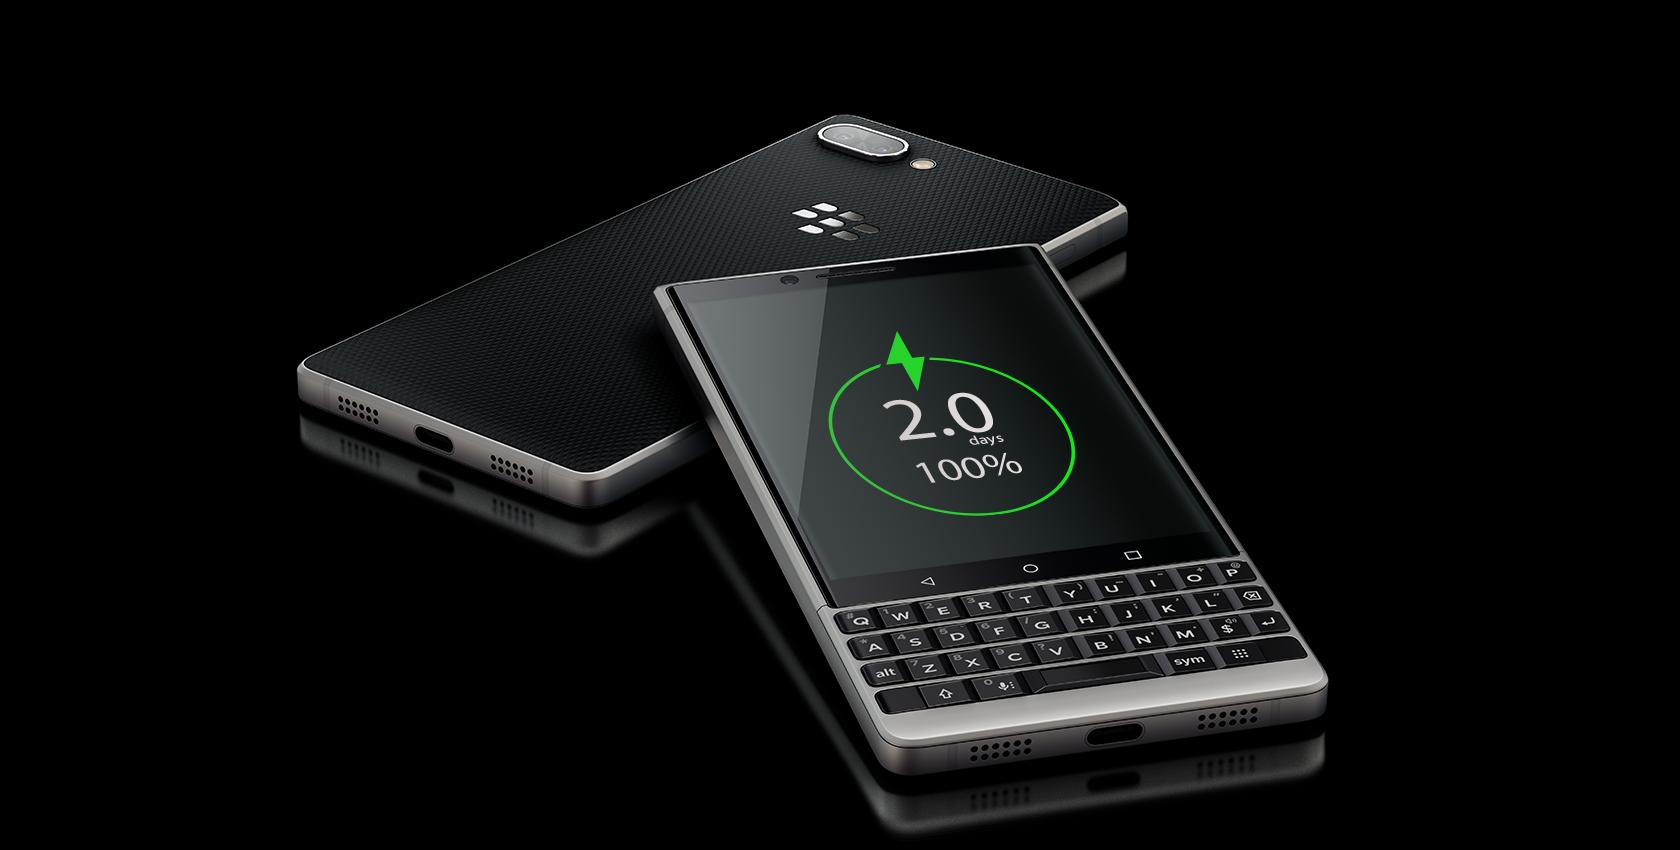 charge desktop1 - BlackBerry KEY2